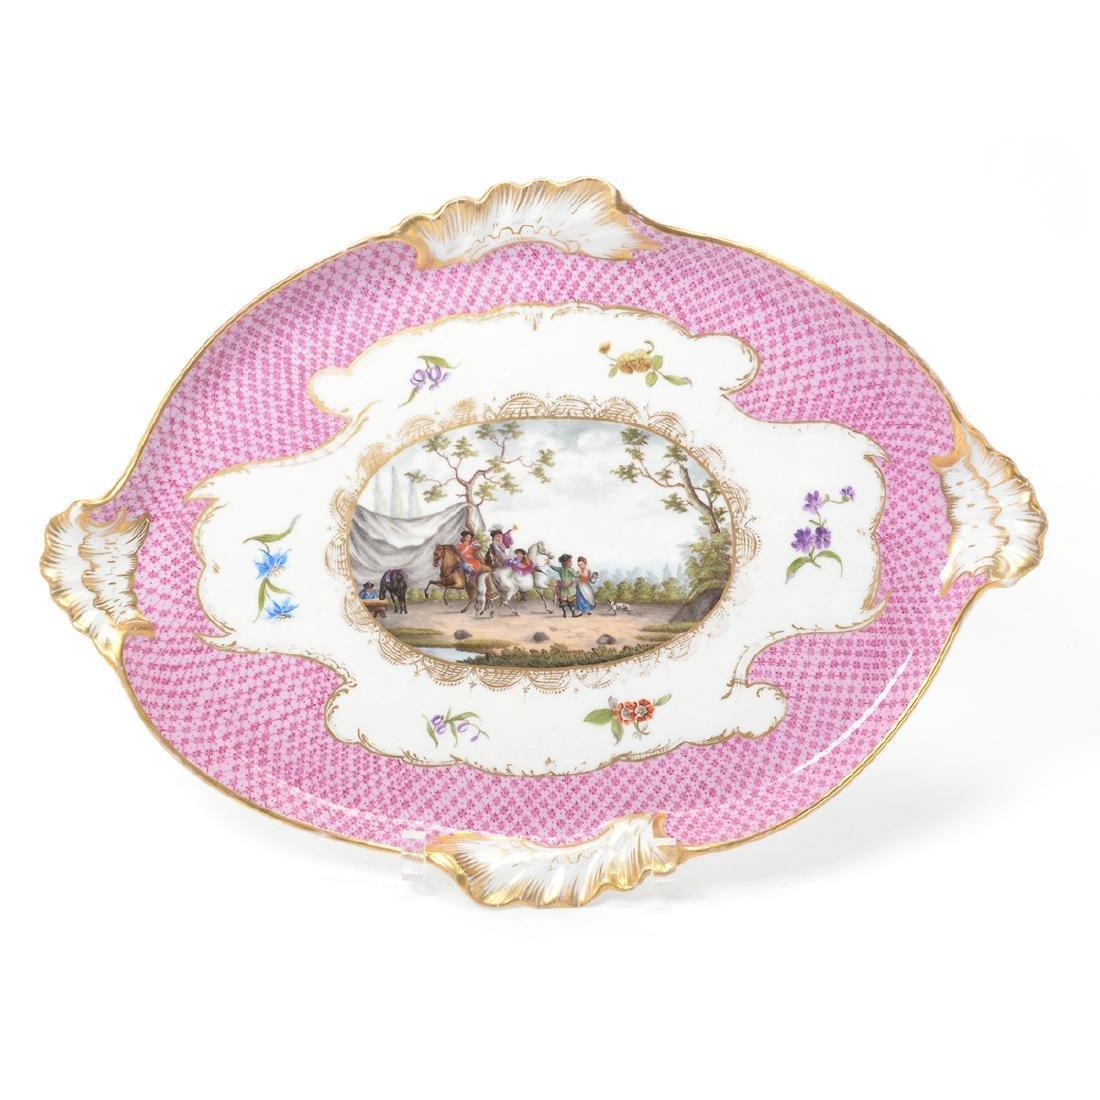 Meissen Six Piece Porcelain Tea Service including Tray - 2